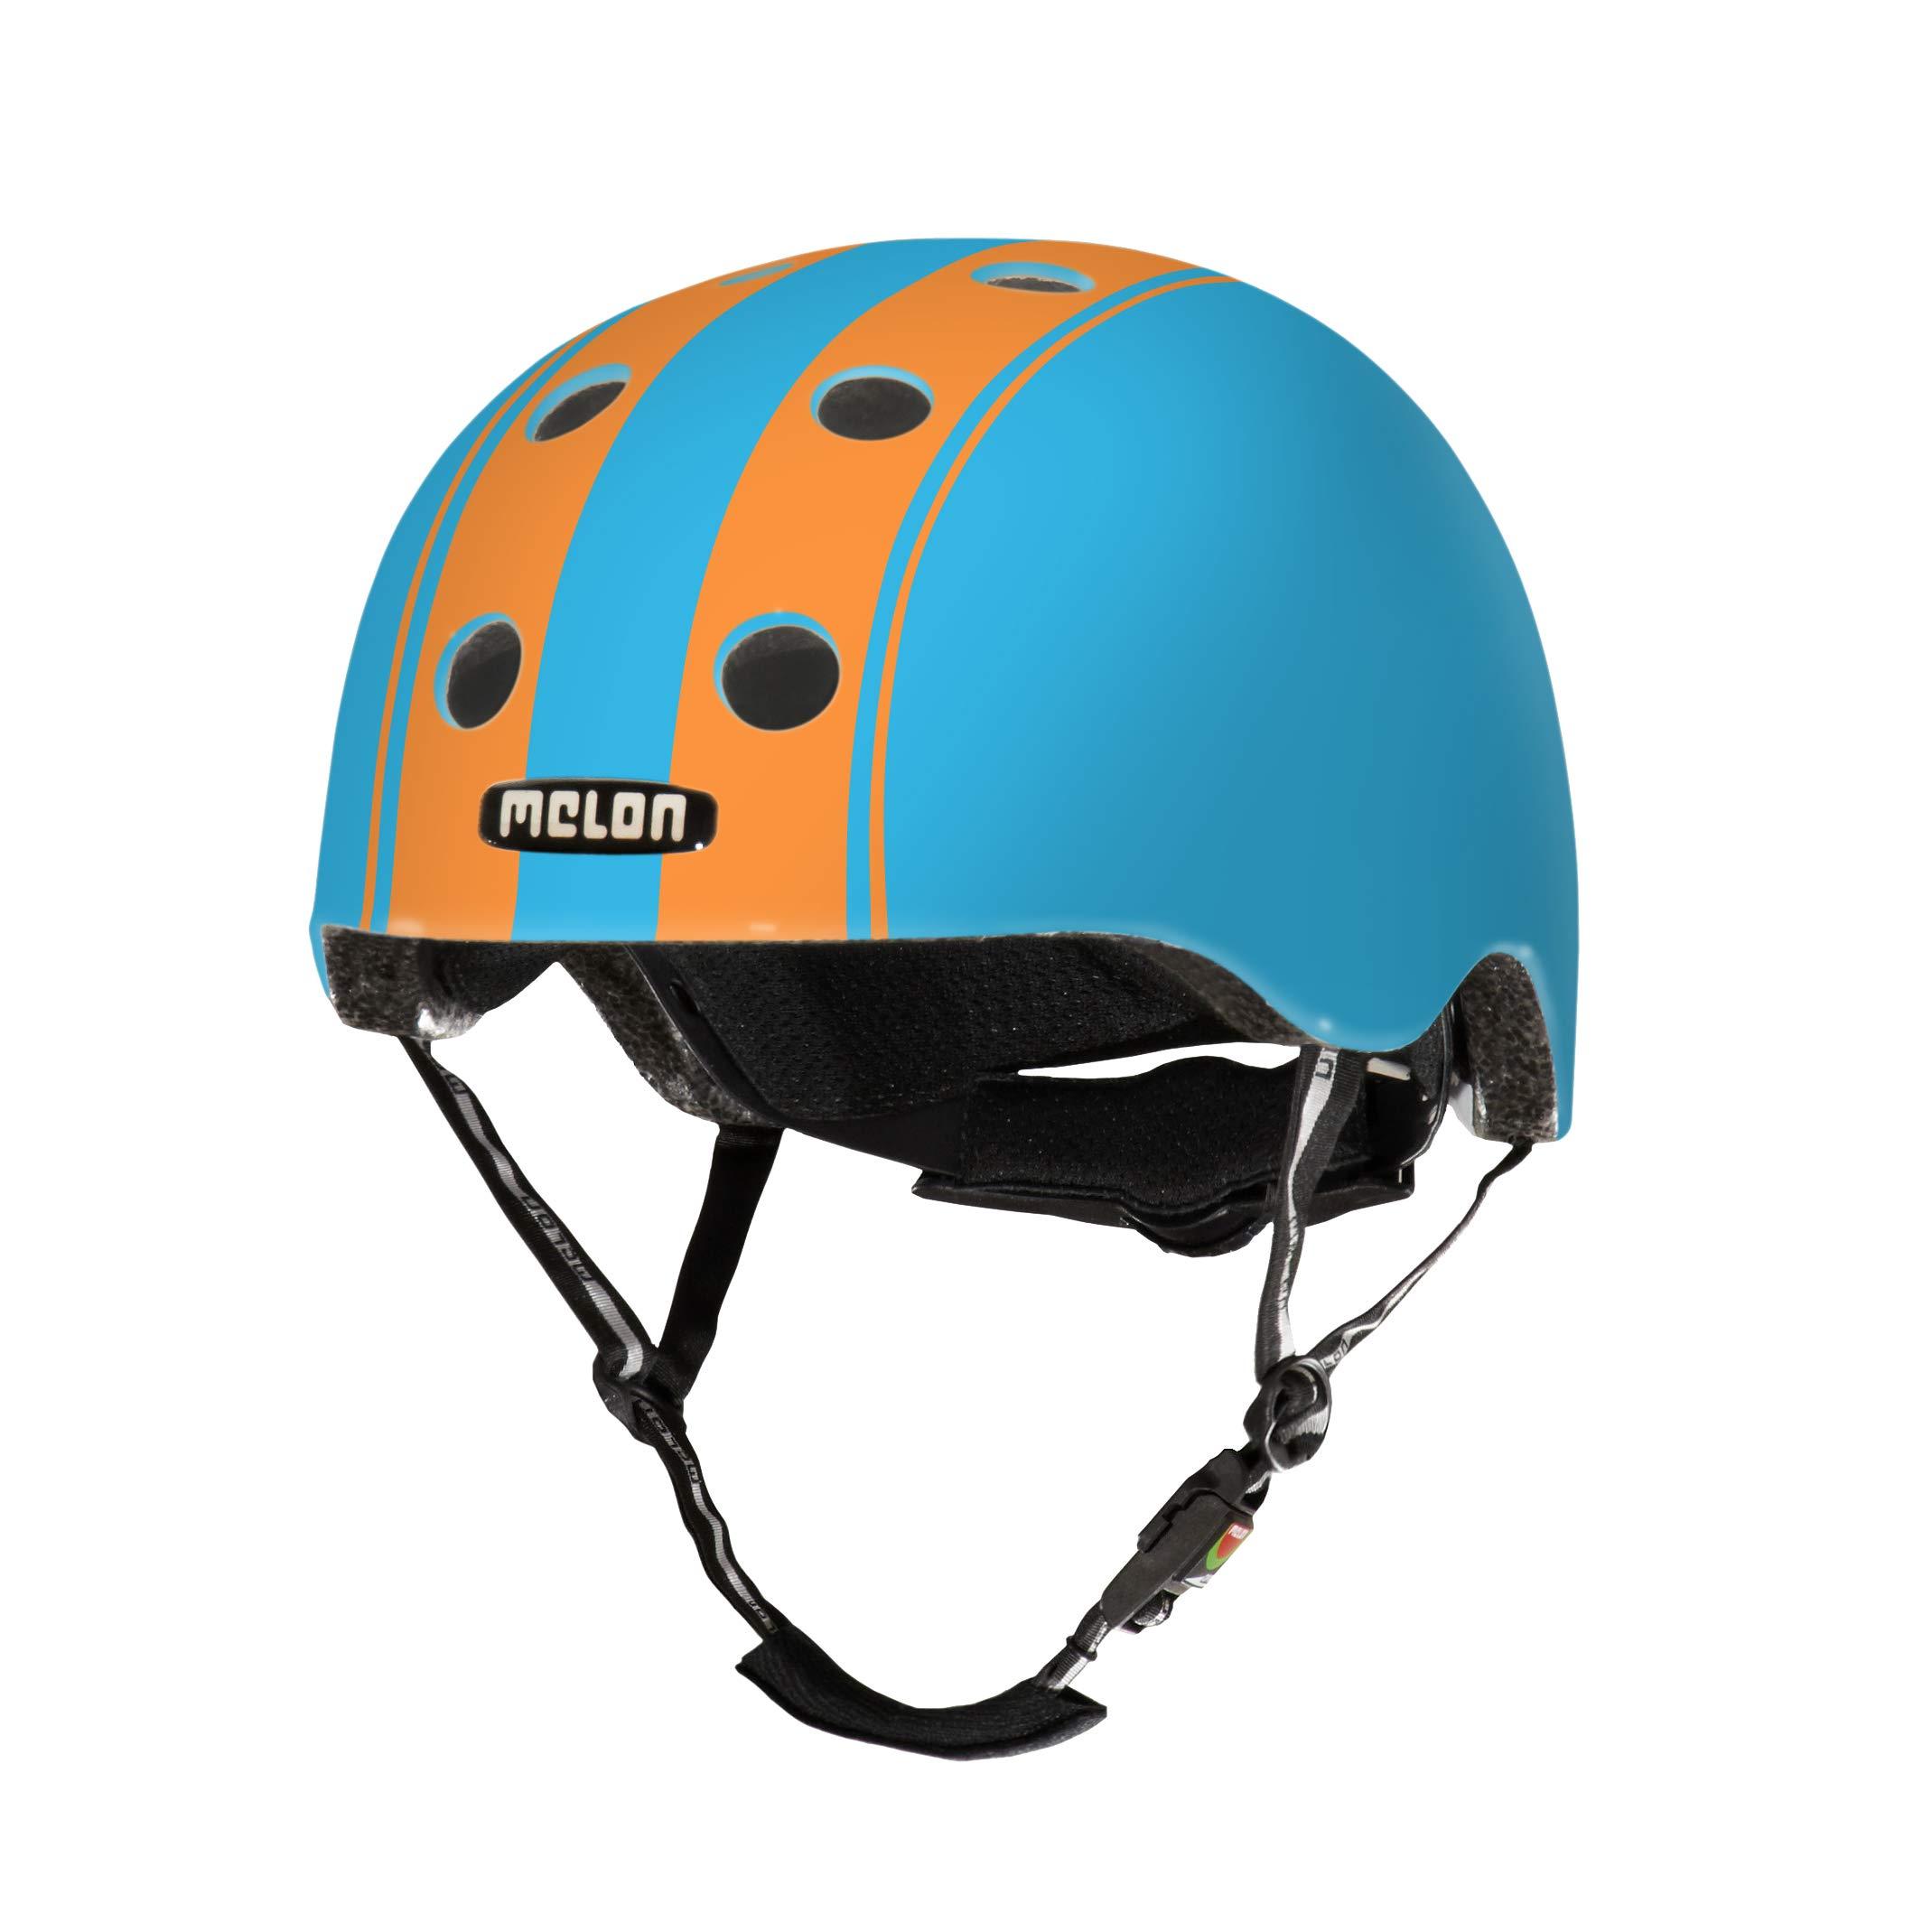 Melon Double Orange Blue Helmet, Blue/Orange, Matte Finish, Small, 46 - 52cm / 18.25 - 20.5in Head Size